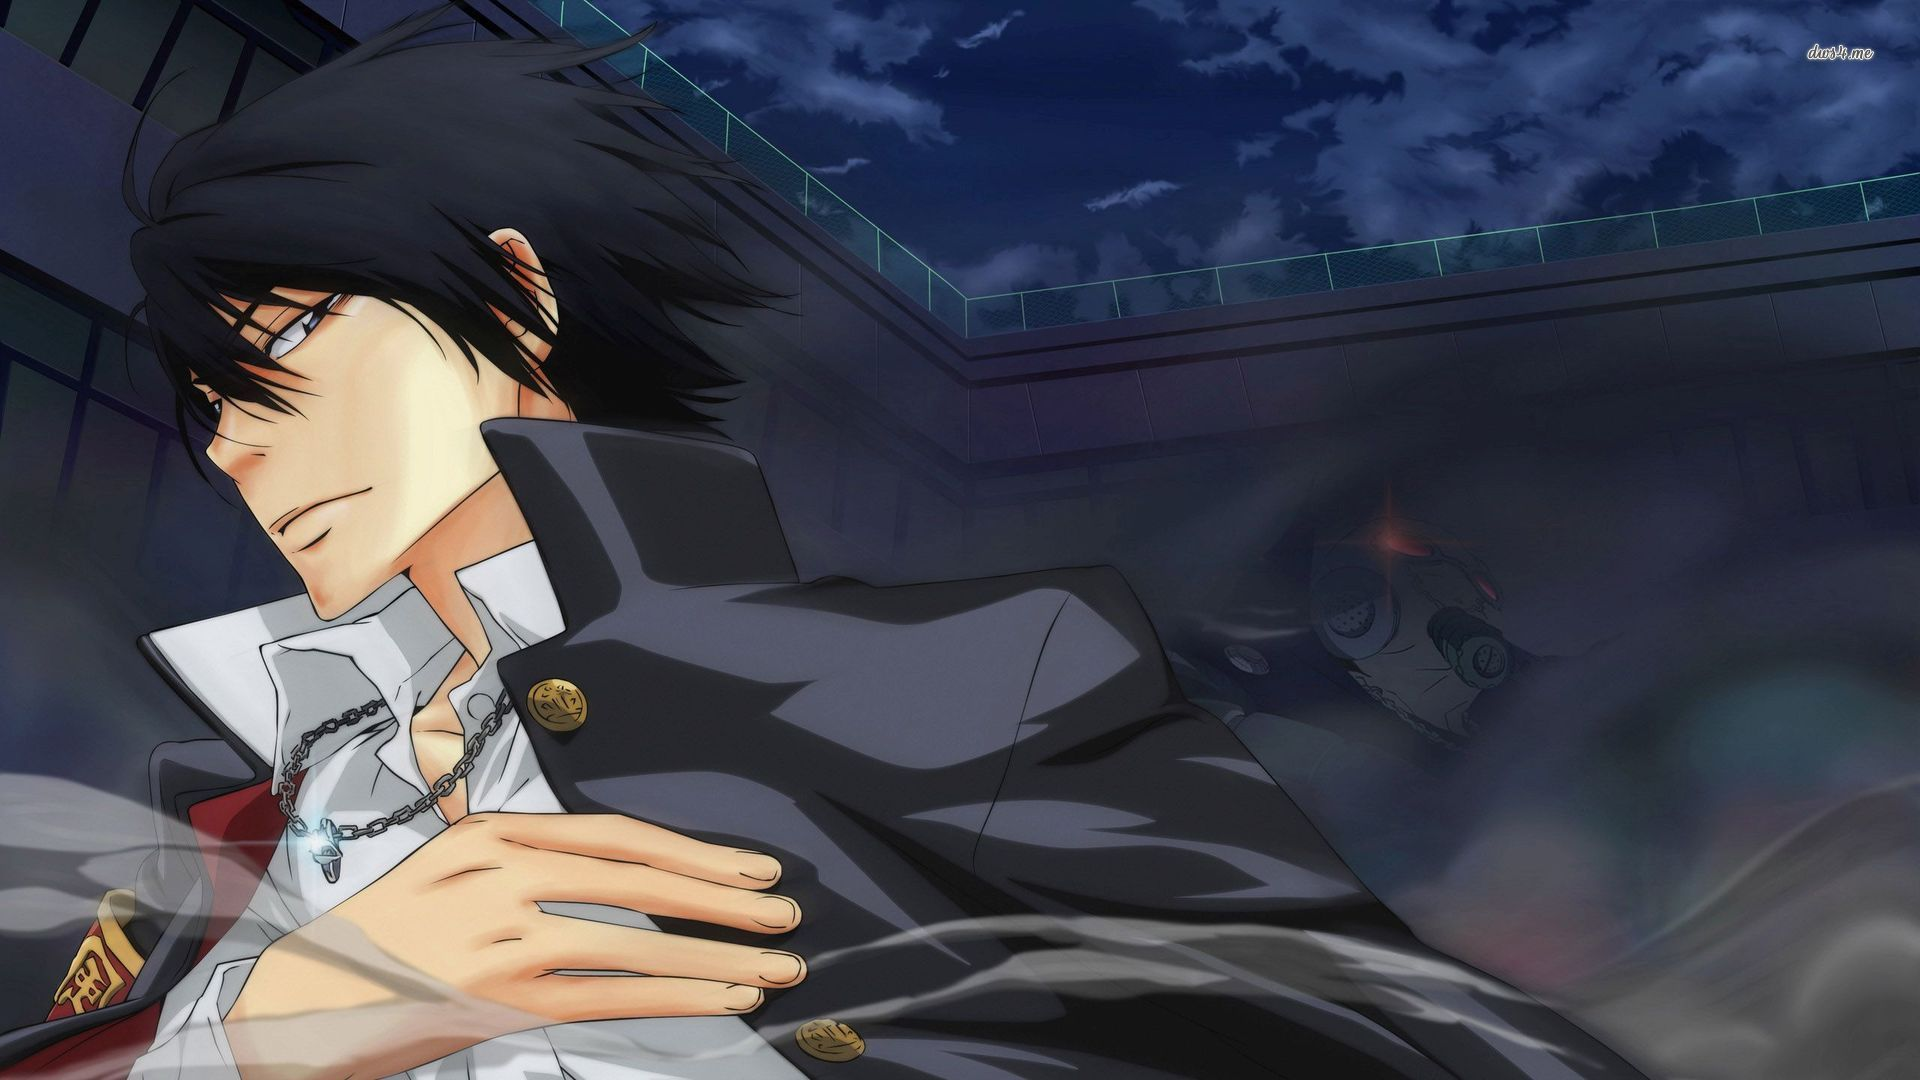 Kyōya Hibari | Wiki Reborn | FANDOM powered by Wikia